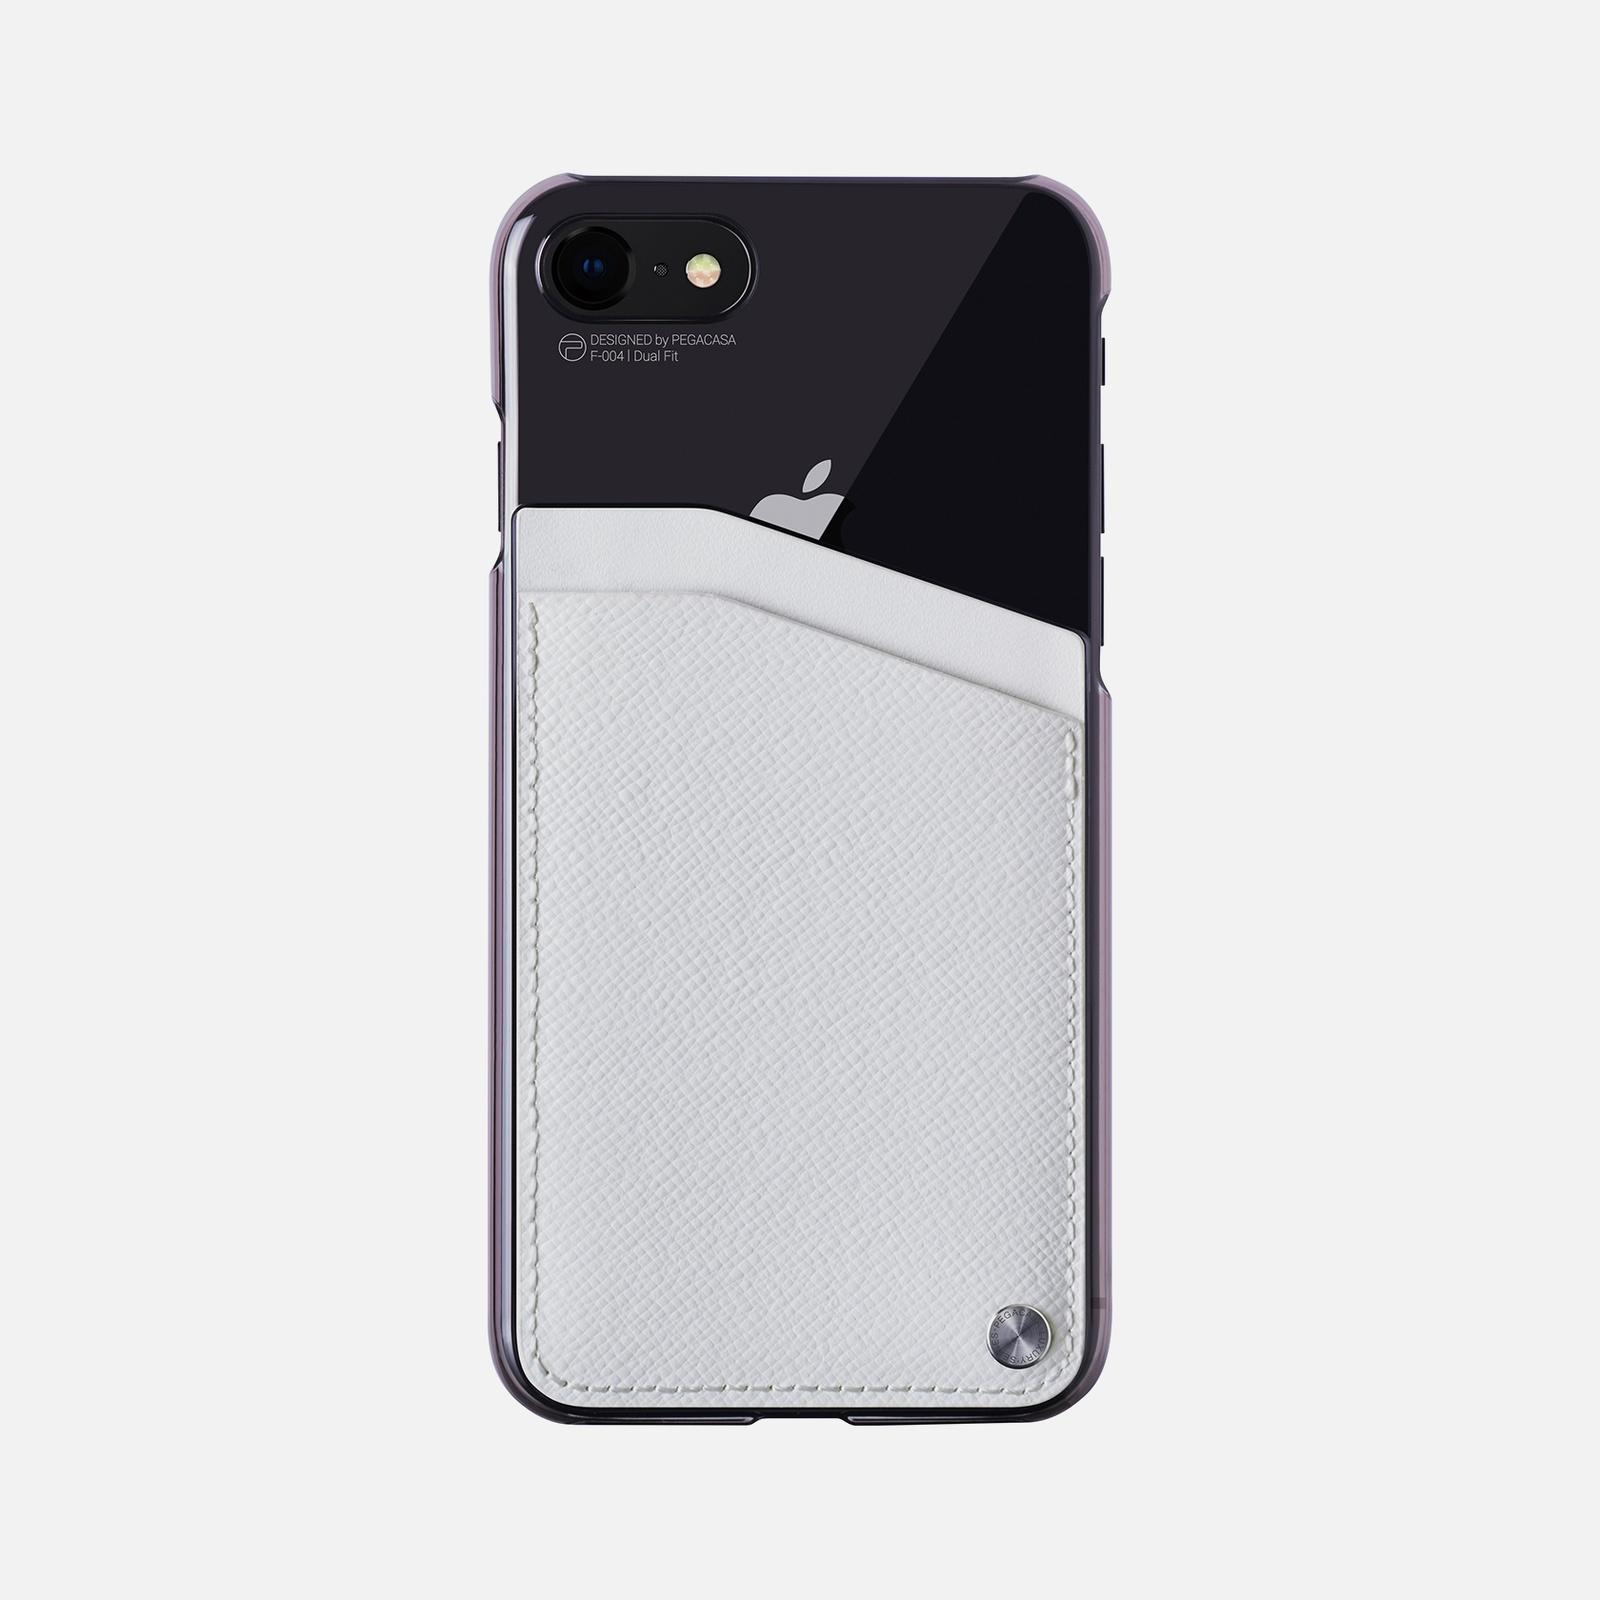 Фото - Чехол для сотового телефона PEGACASA F-004-W-4.7, белый calmoon 004 high quality dual ring detachable keychain keyring black silver